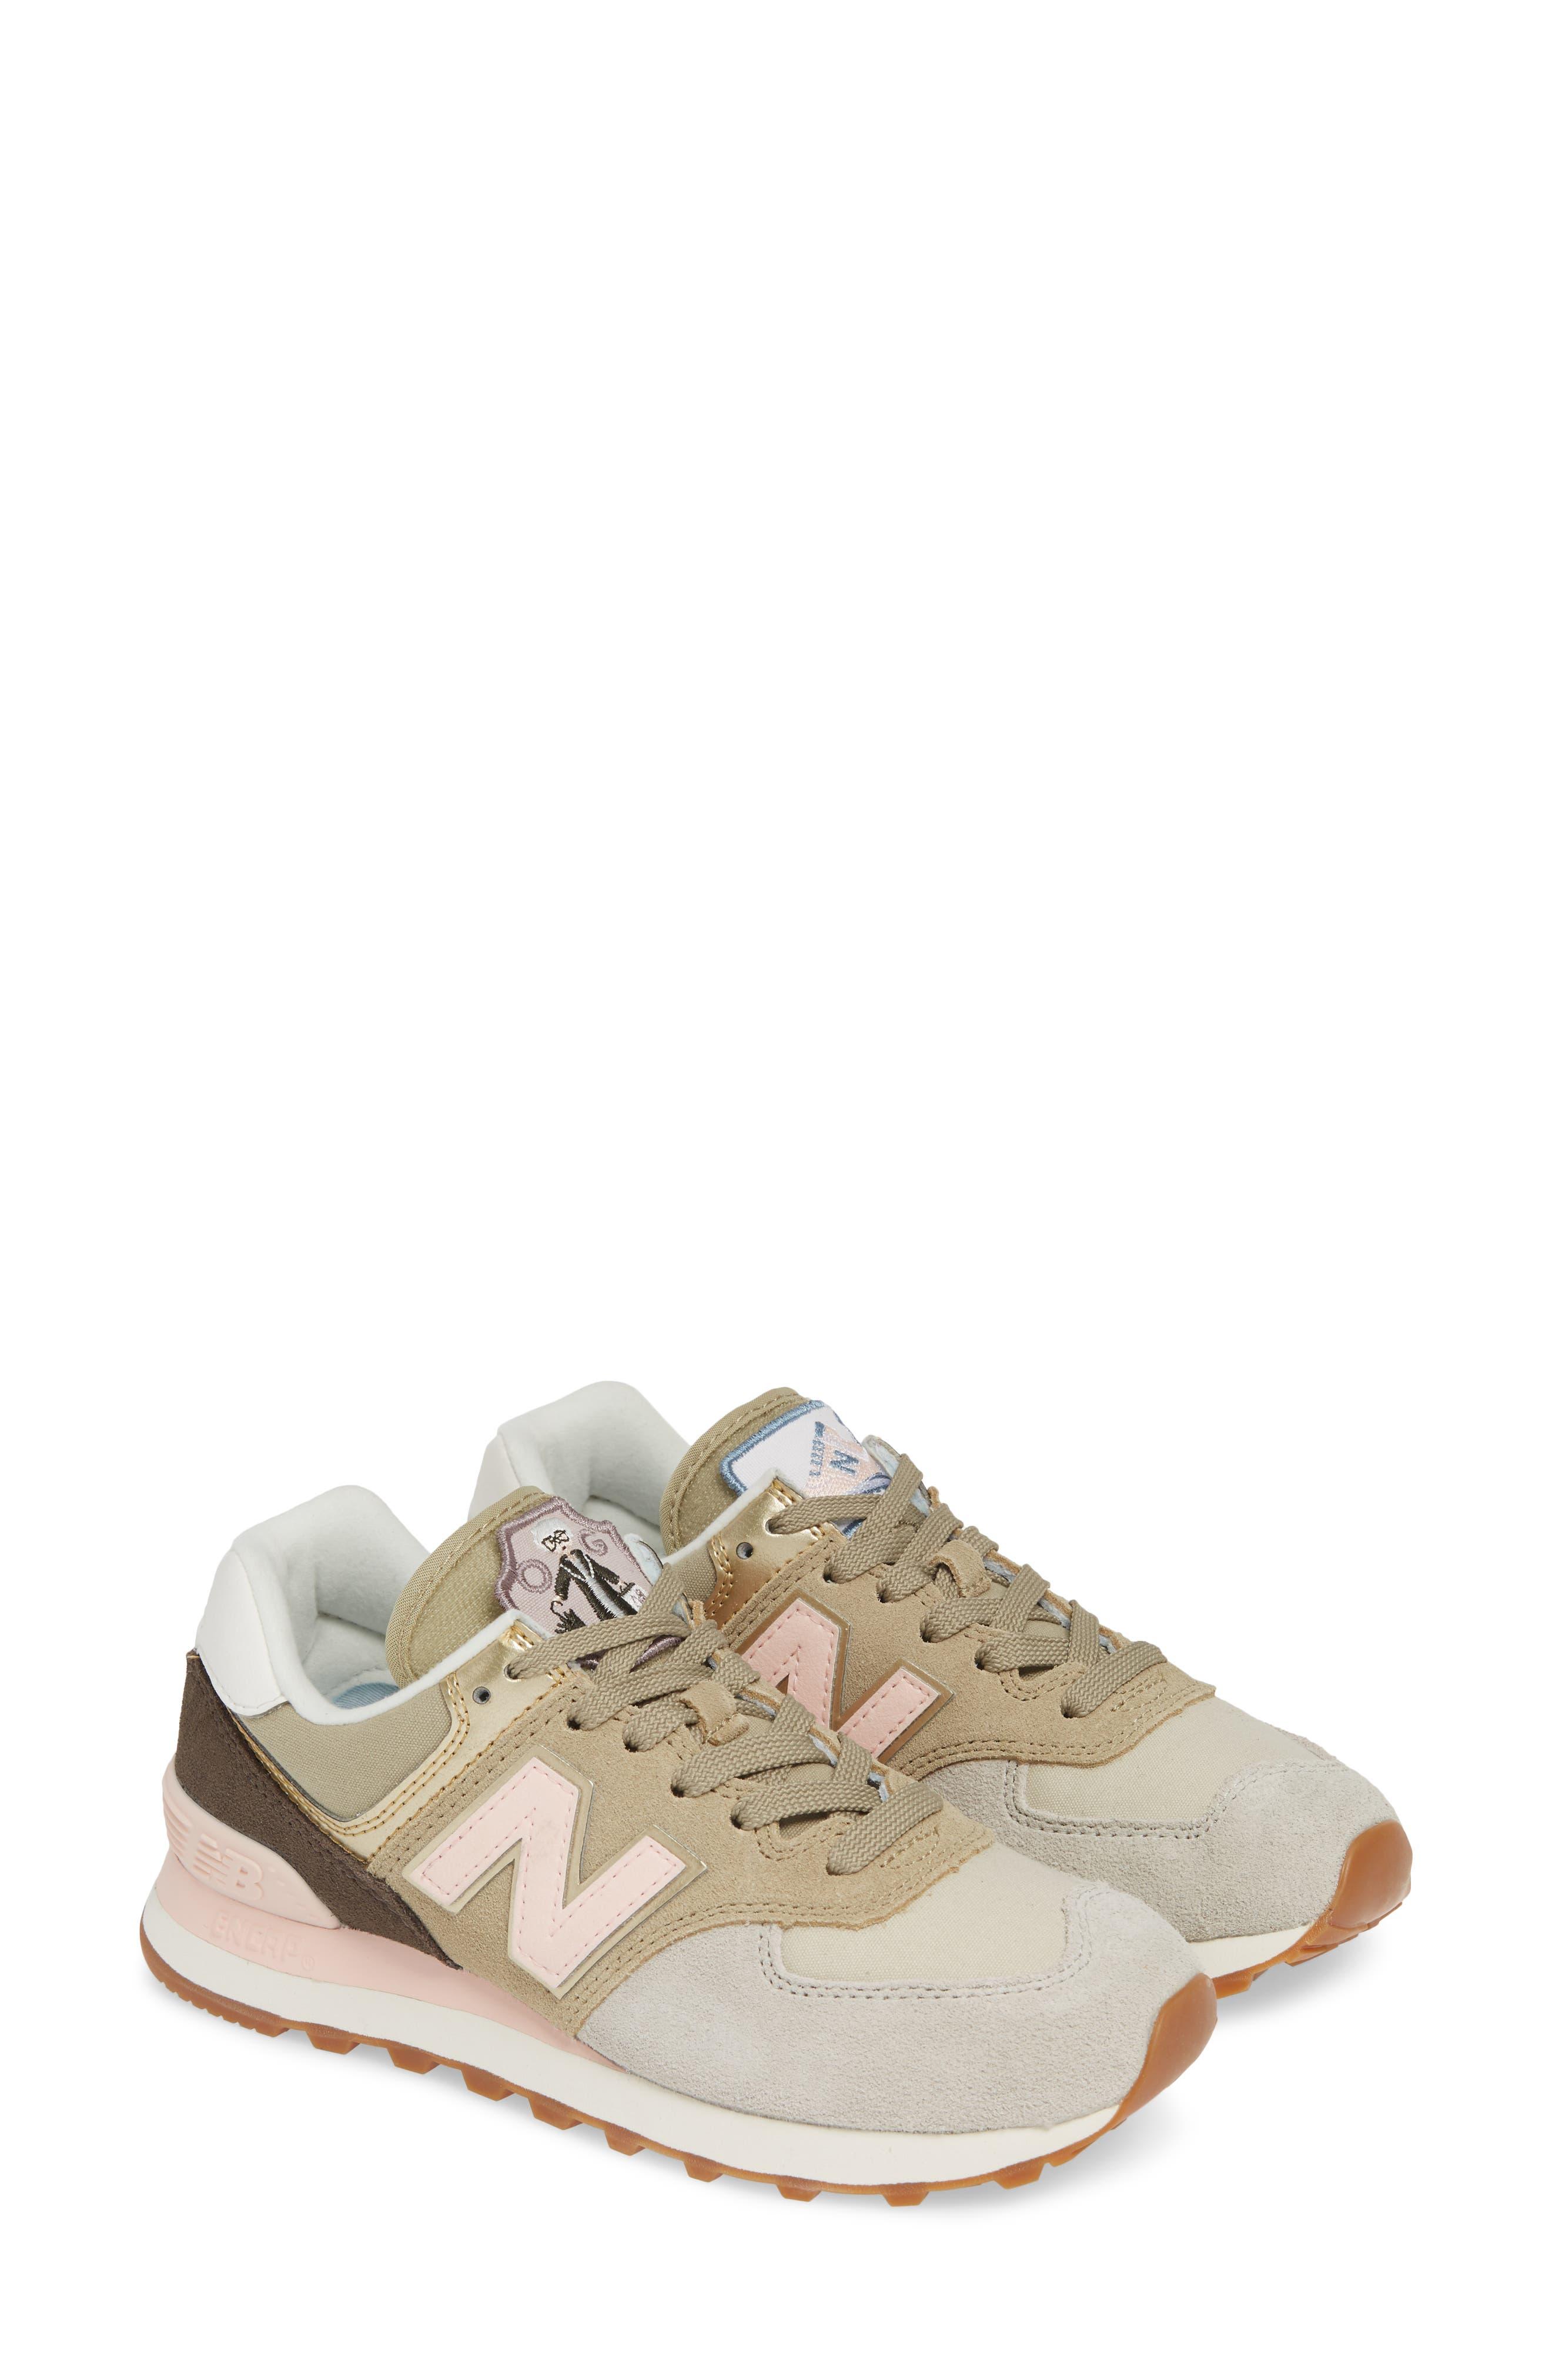 NEW BALANCE 574 Metallic Patch Sneaker, Main, color, LIGHT CLIFF GREY